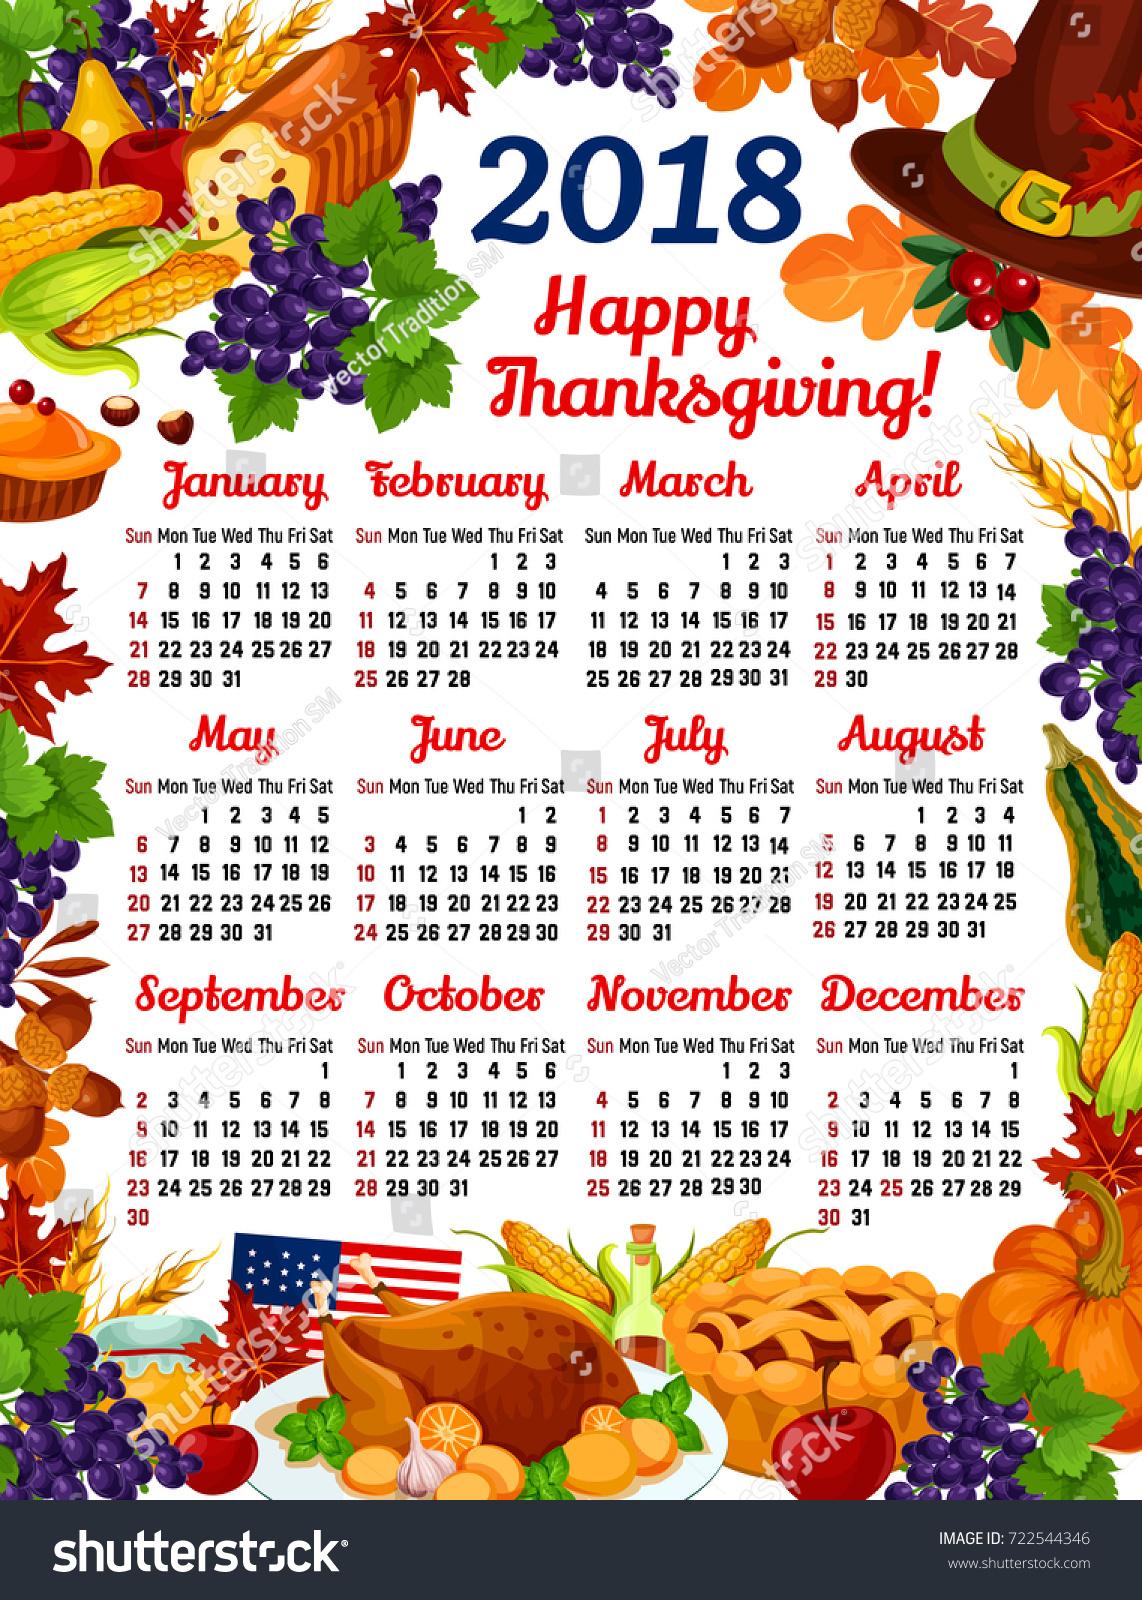 Turkey Day Hercules Style: Thanksgiving Day 2018 Calendar Template Design Stock